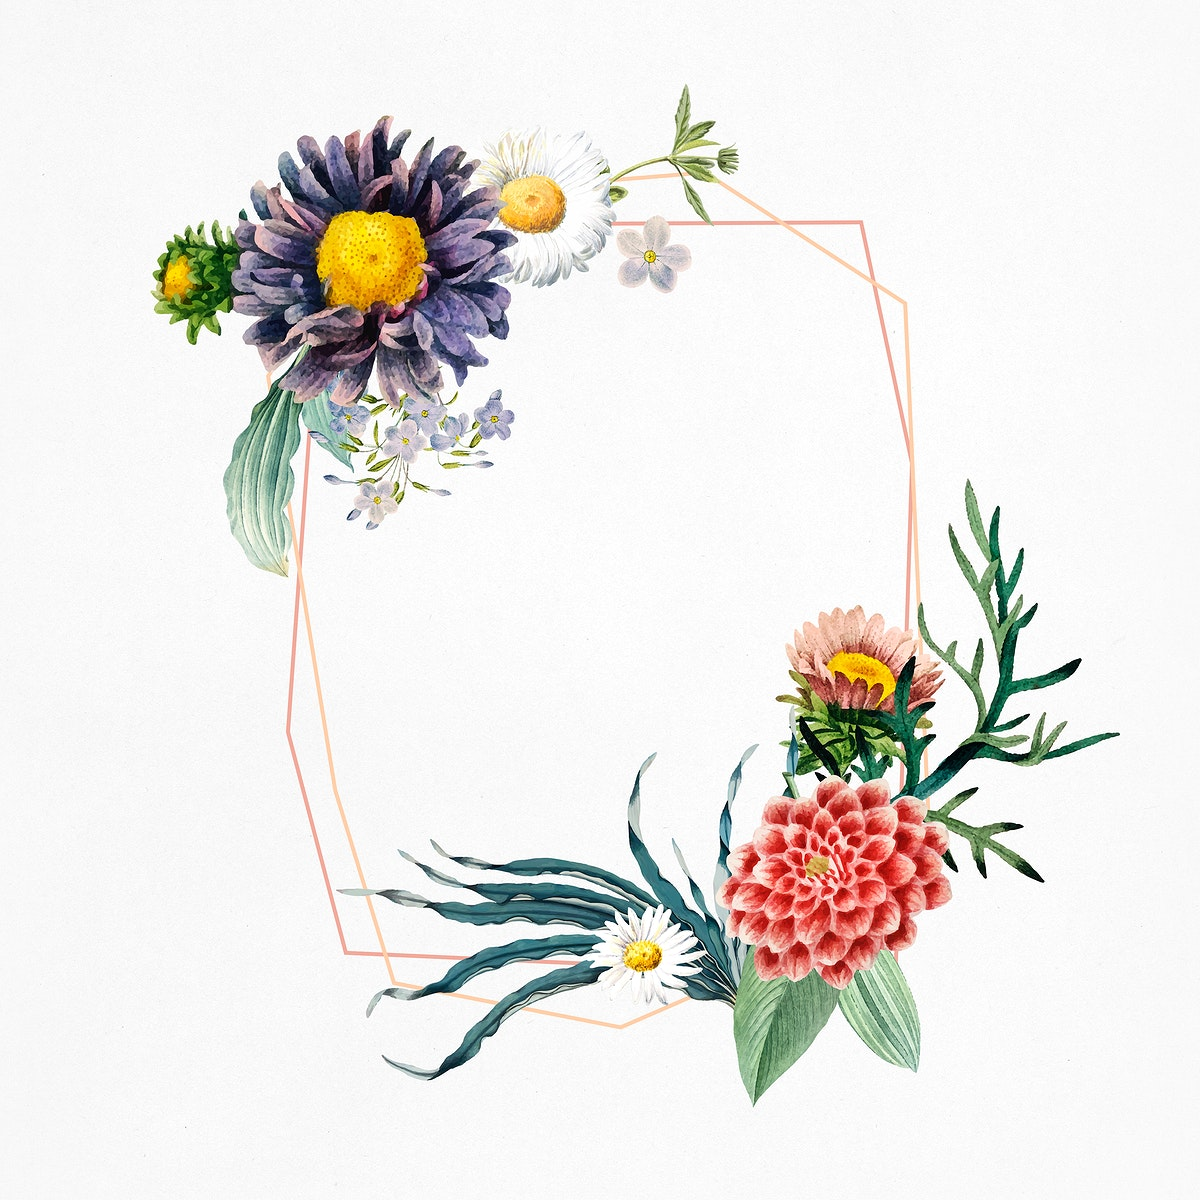 Summer flower frame psd hand drawn floral  illustrations